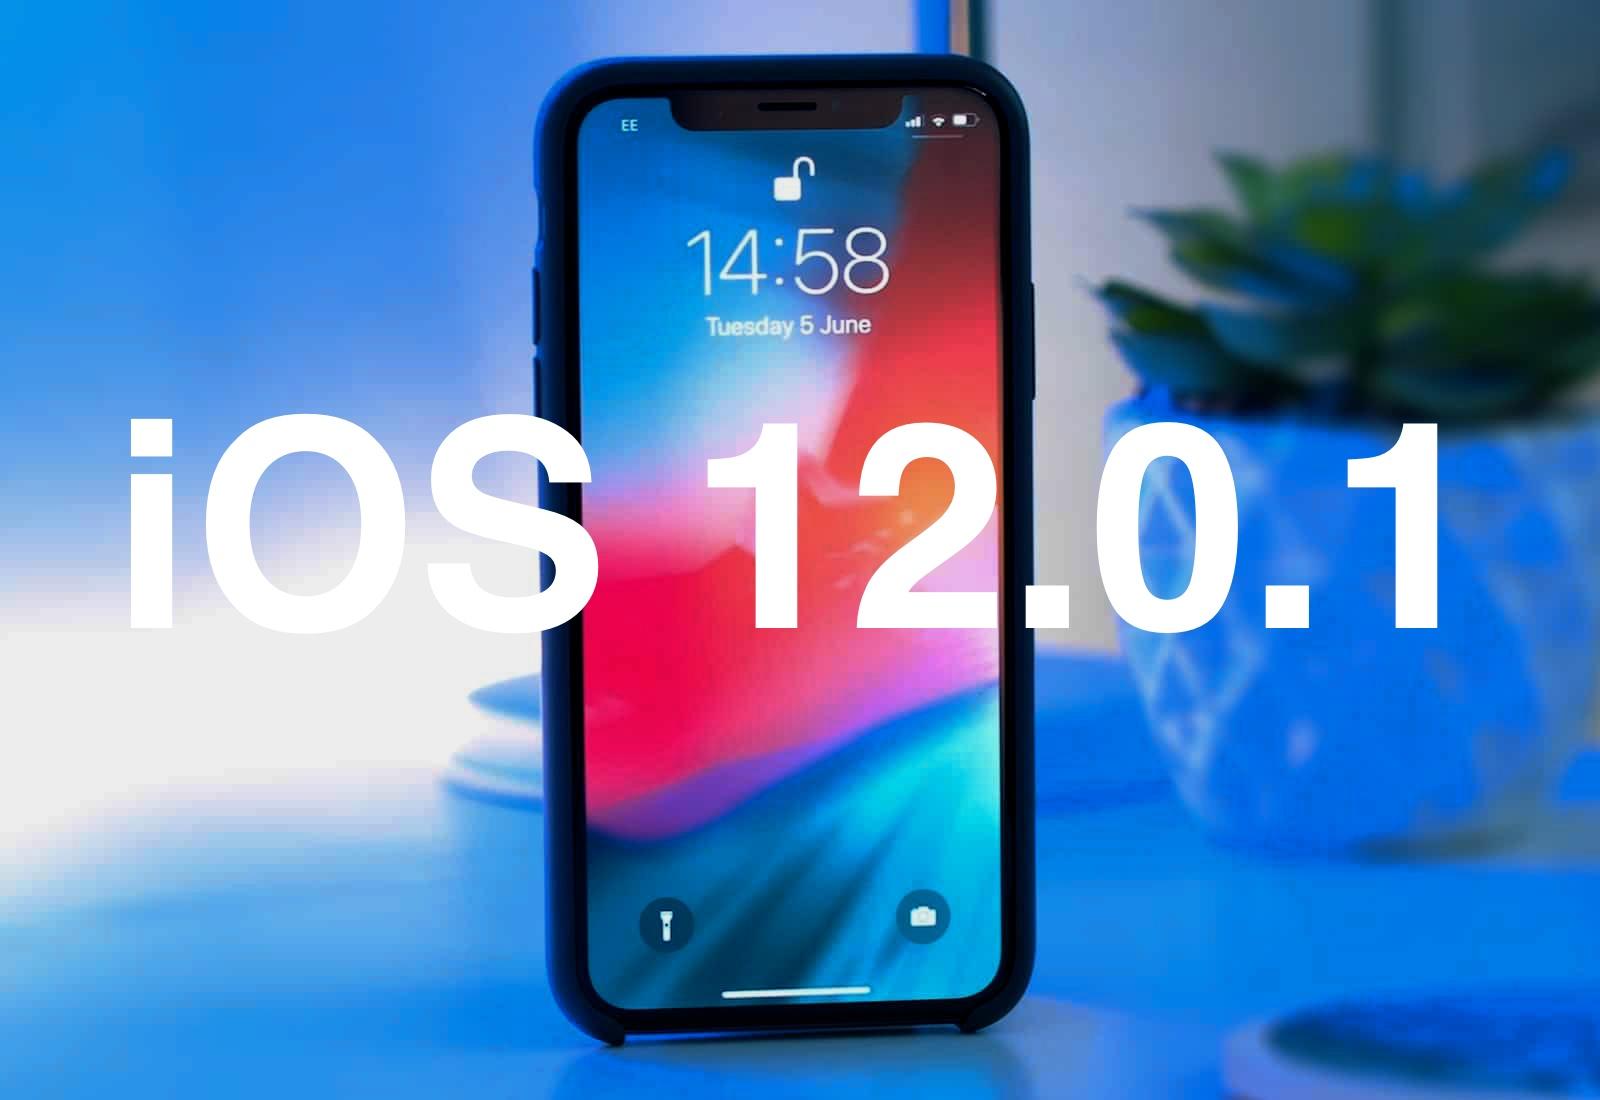 Apple has released iOS 12.0.1